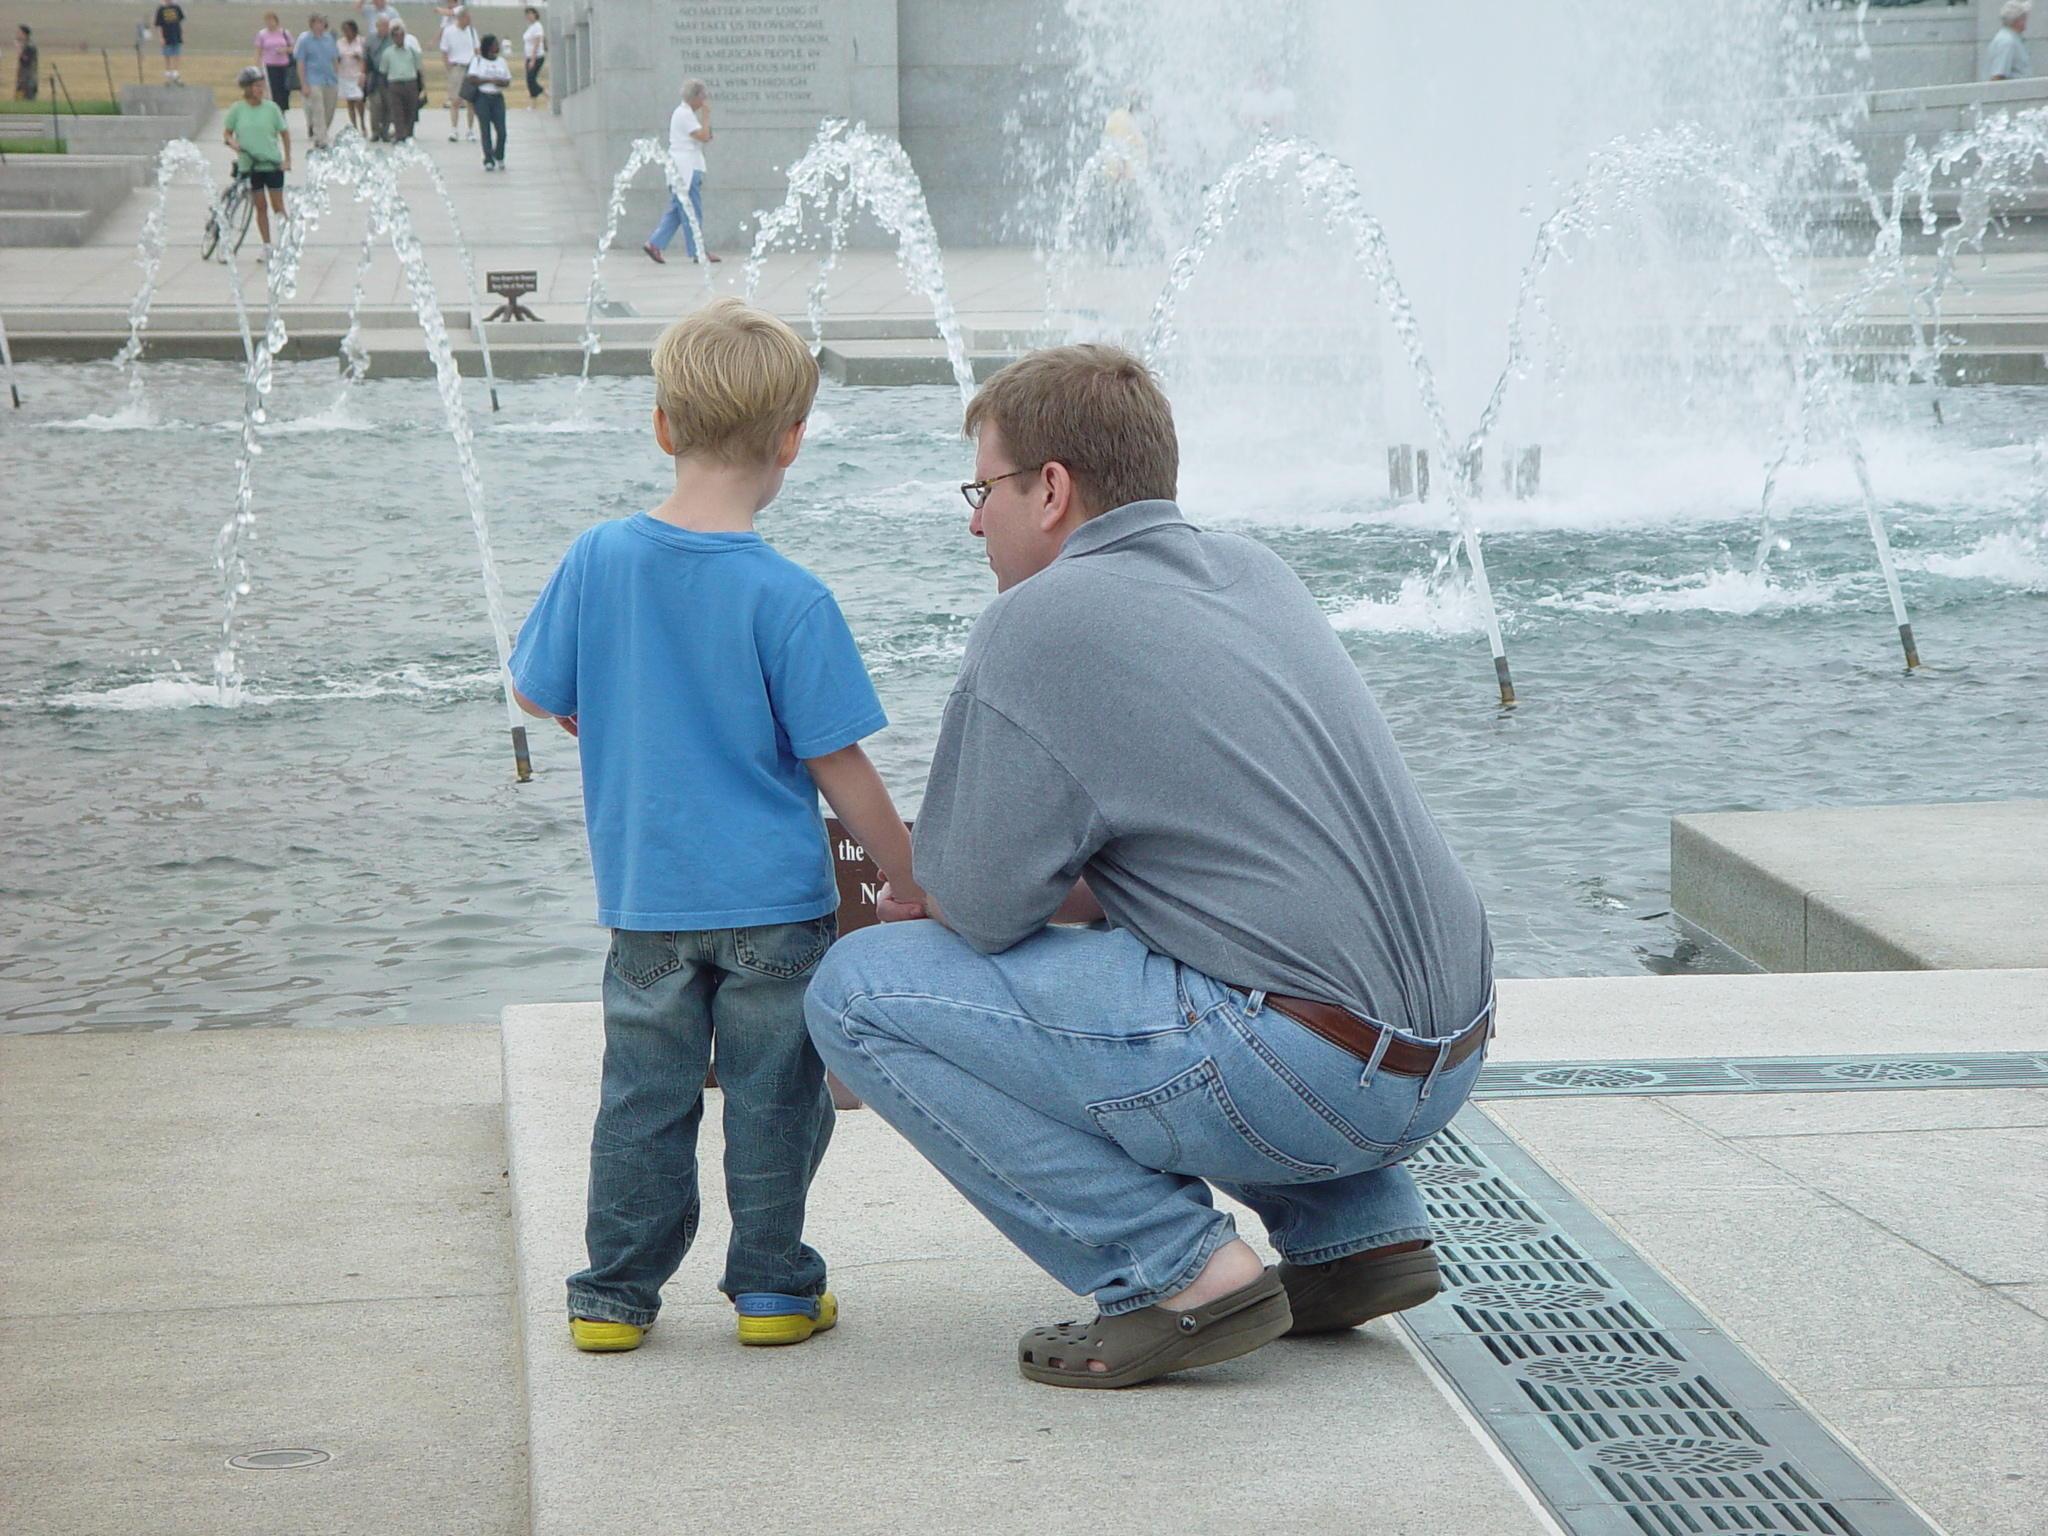 dads matter too aims to strengthen families wnpr news